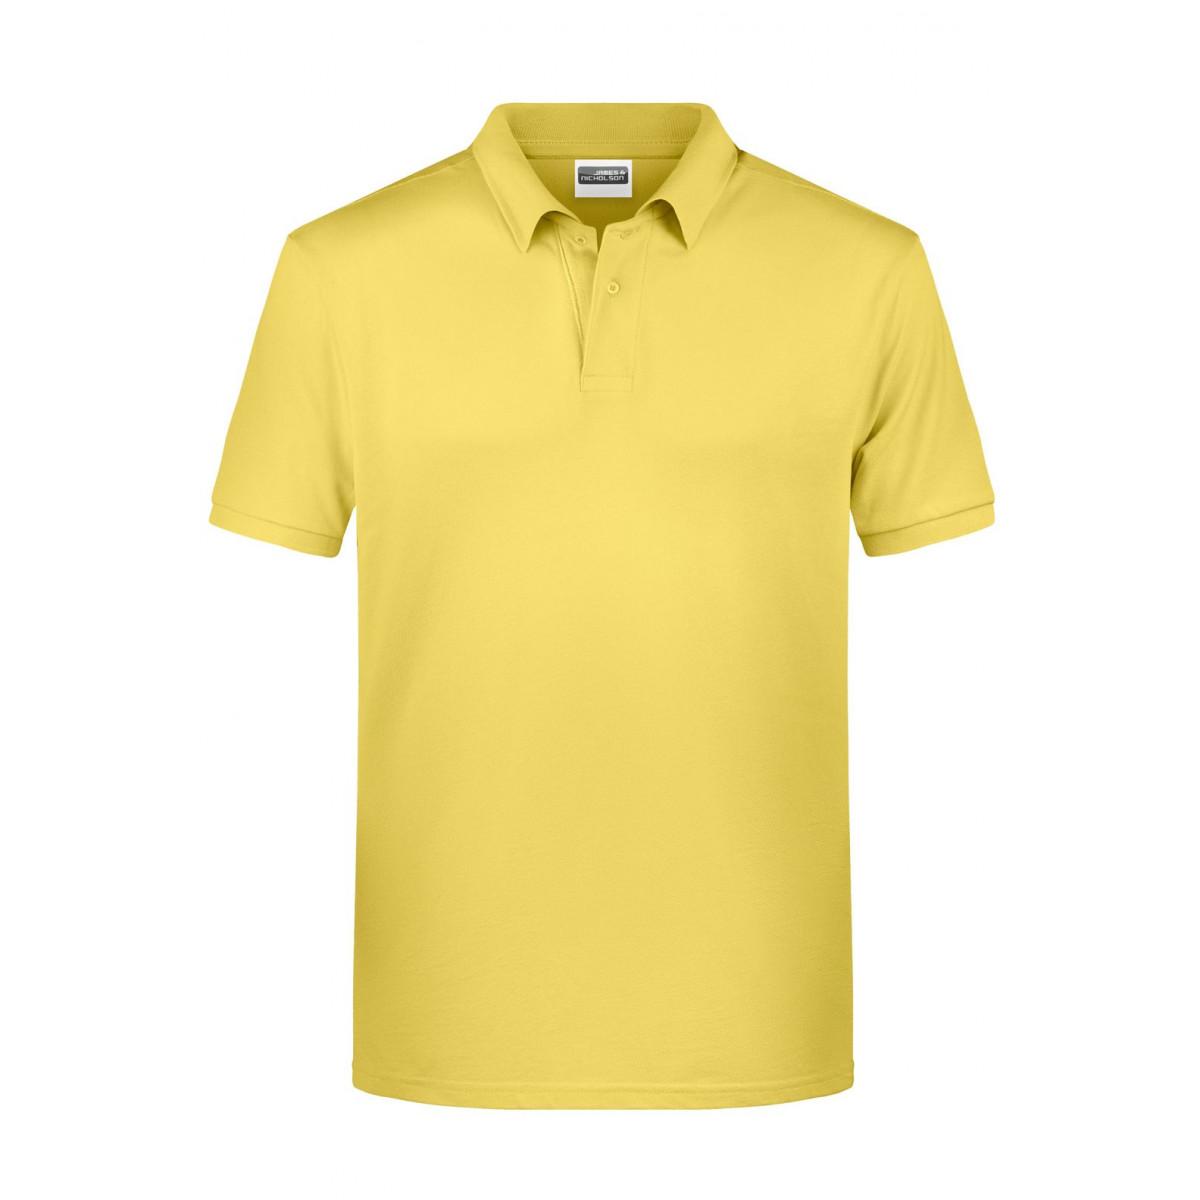 Рубашка поло мужская 8010 Mens Basic Polo - Светло-желтый